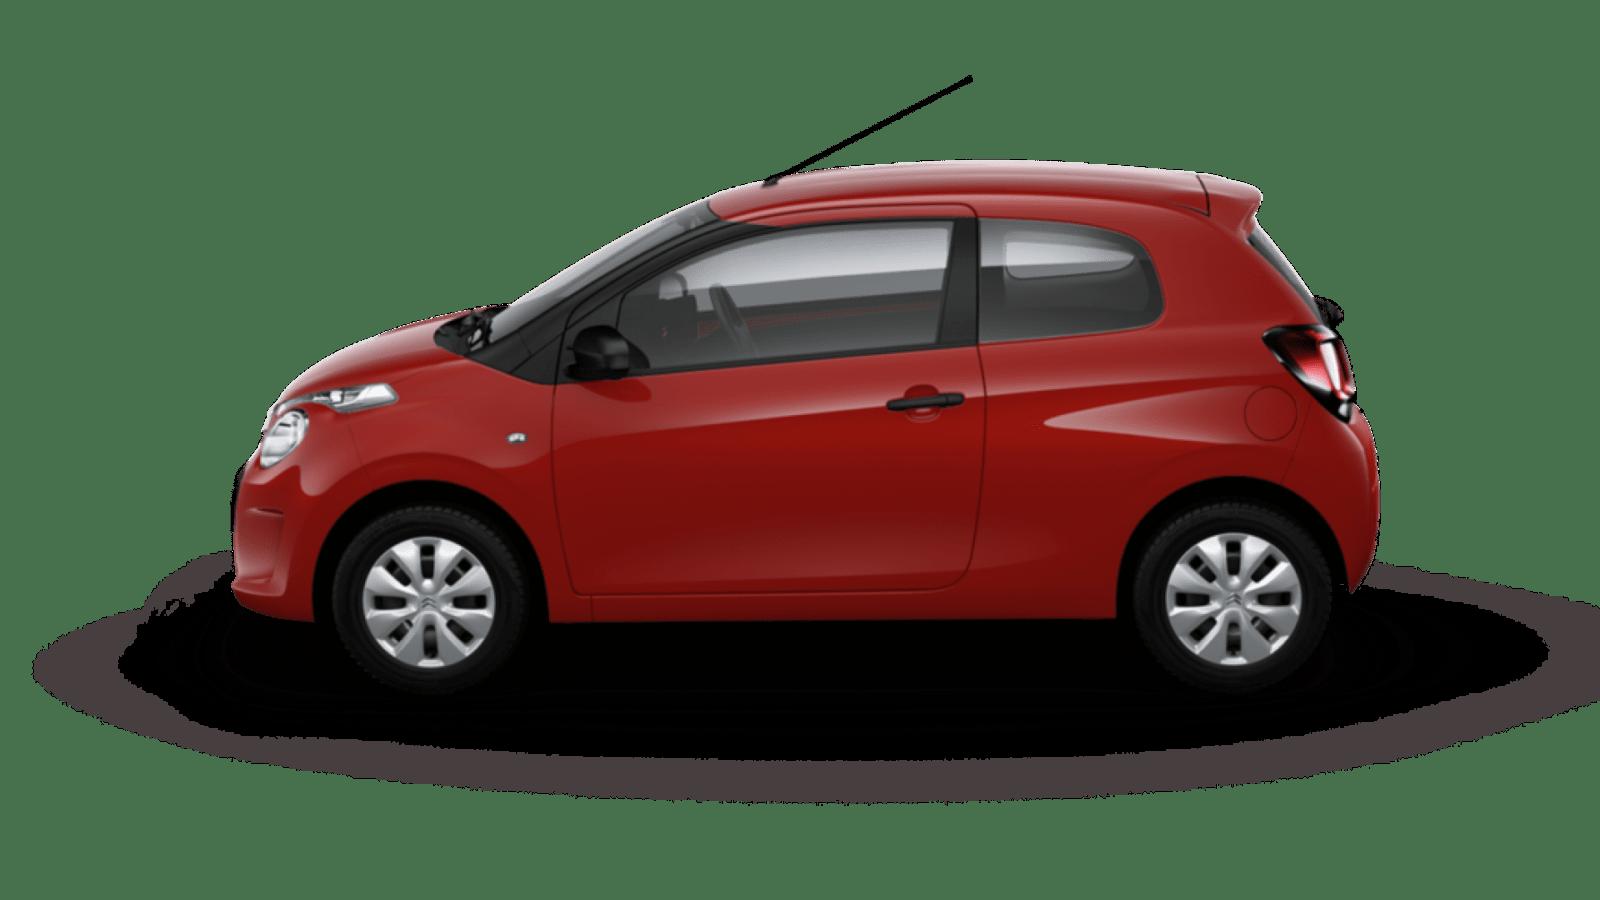 c1, Most Cost-Efficient New Cars